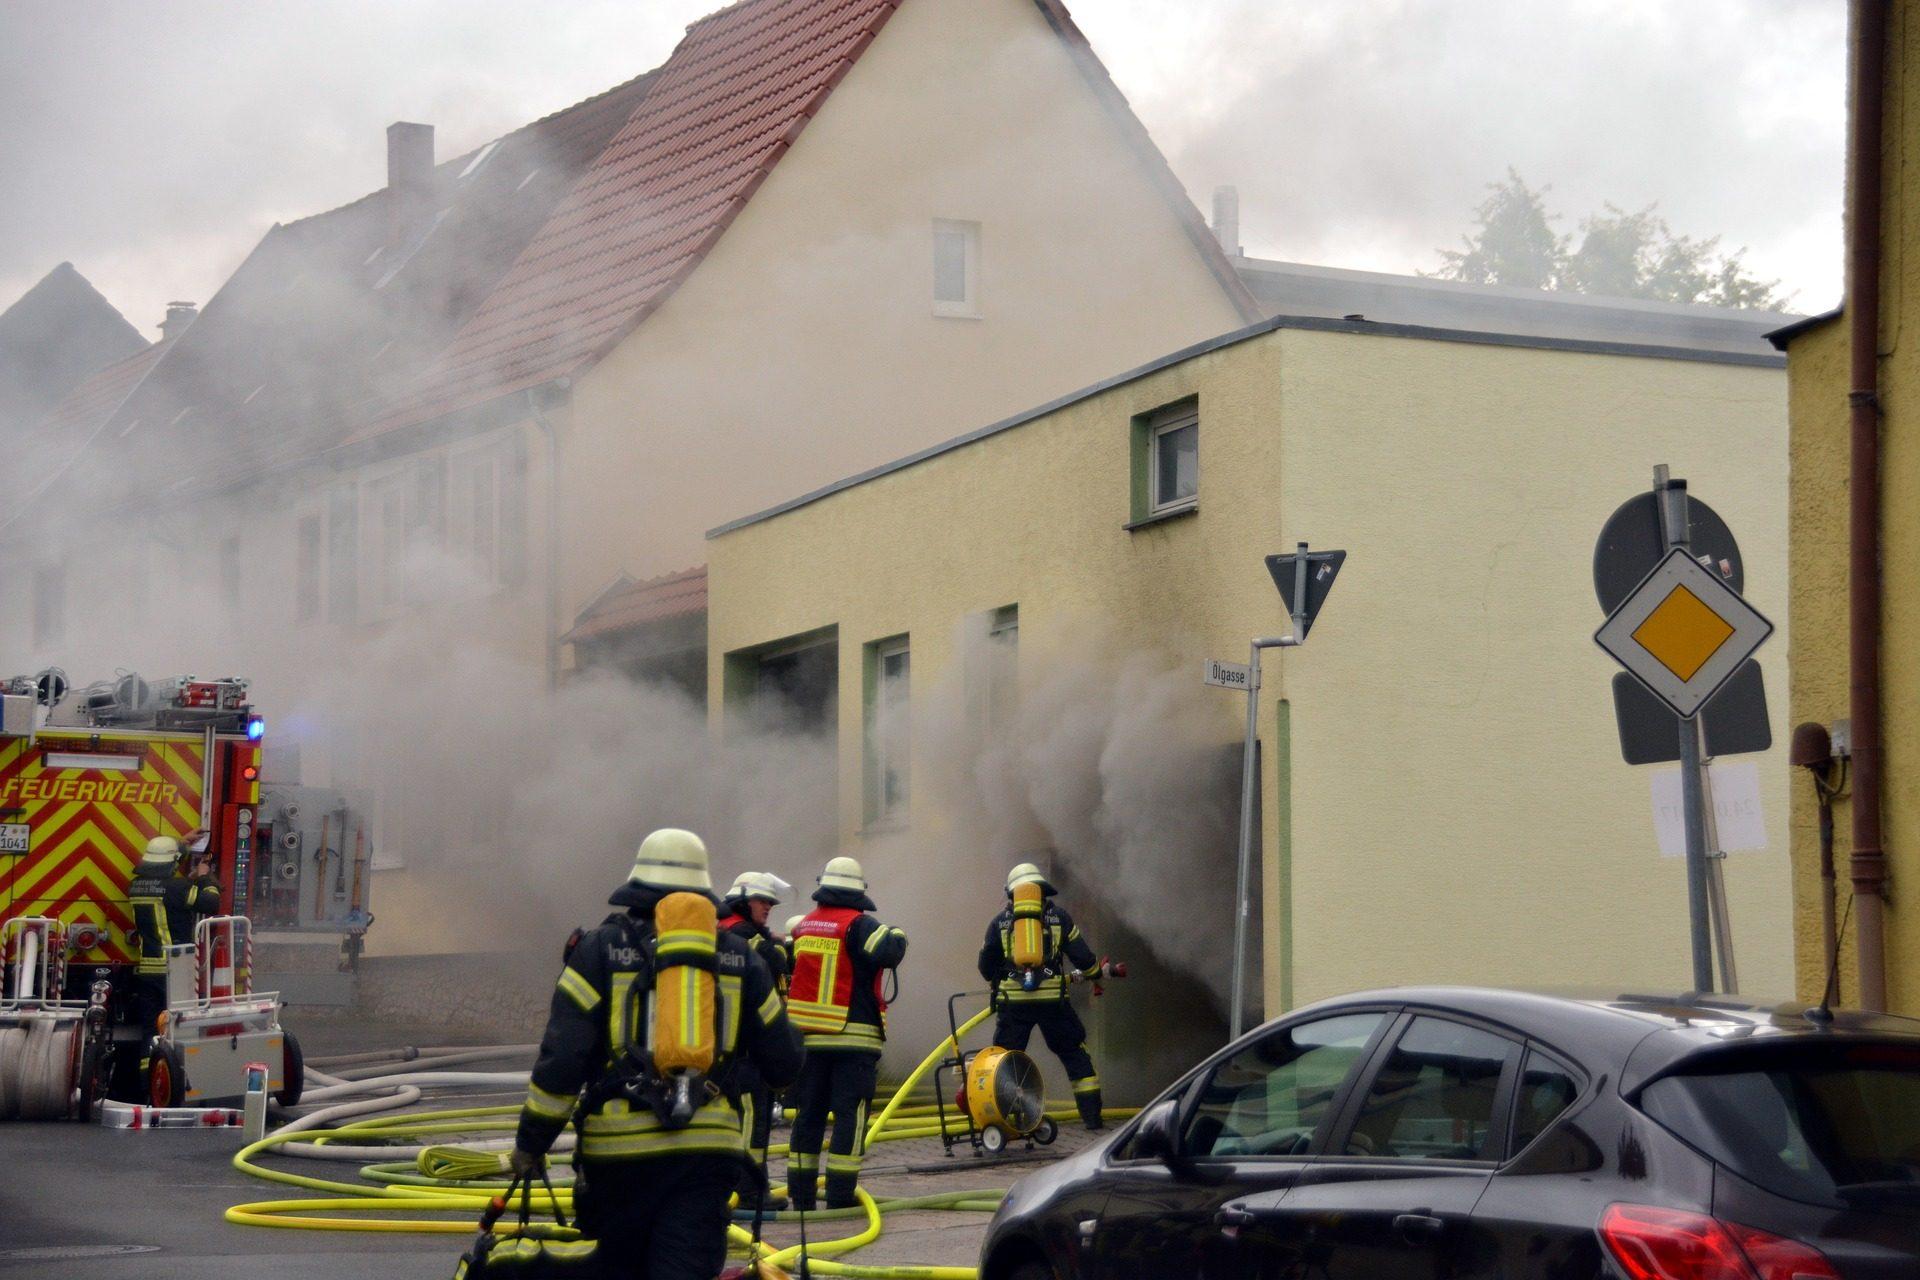 Casa, incendio, fumaçfogoros, mangueiras - Papéis de parede HD - Professor-falken.com